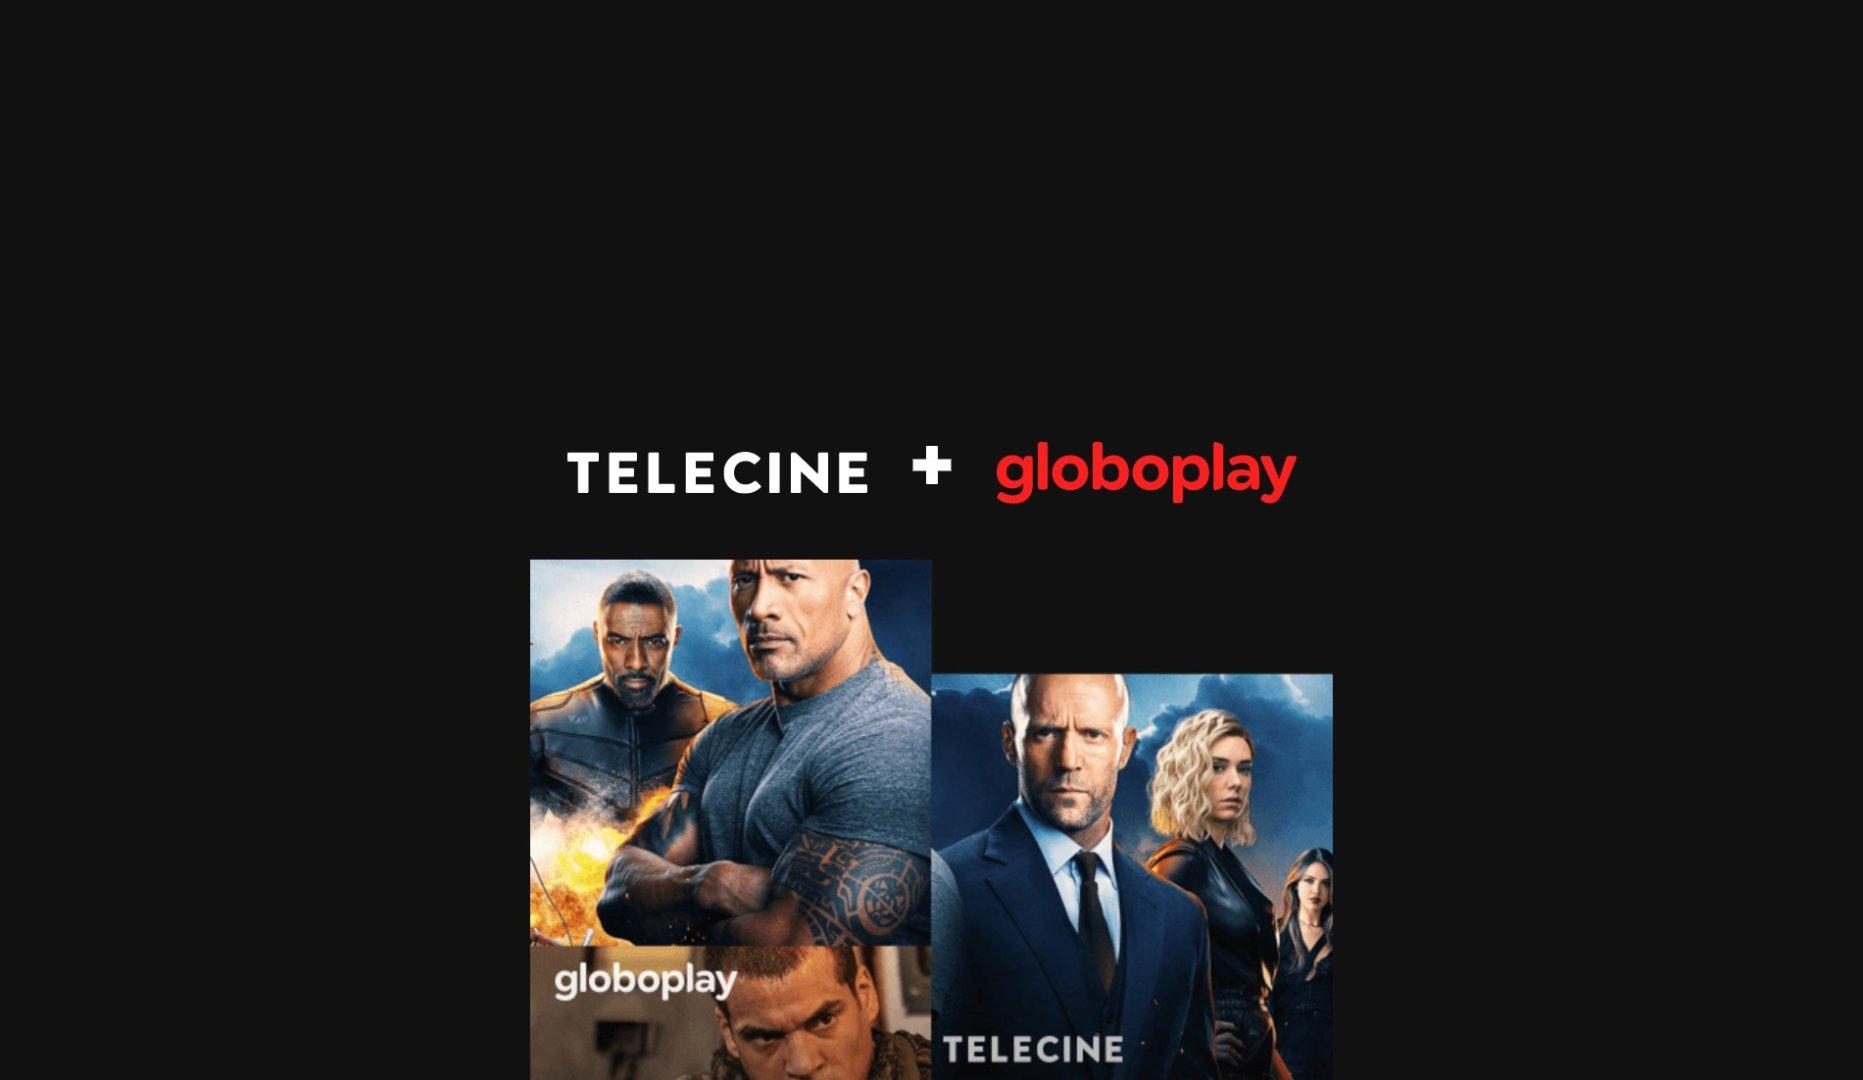 globoplay+telecine